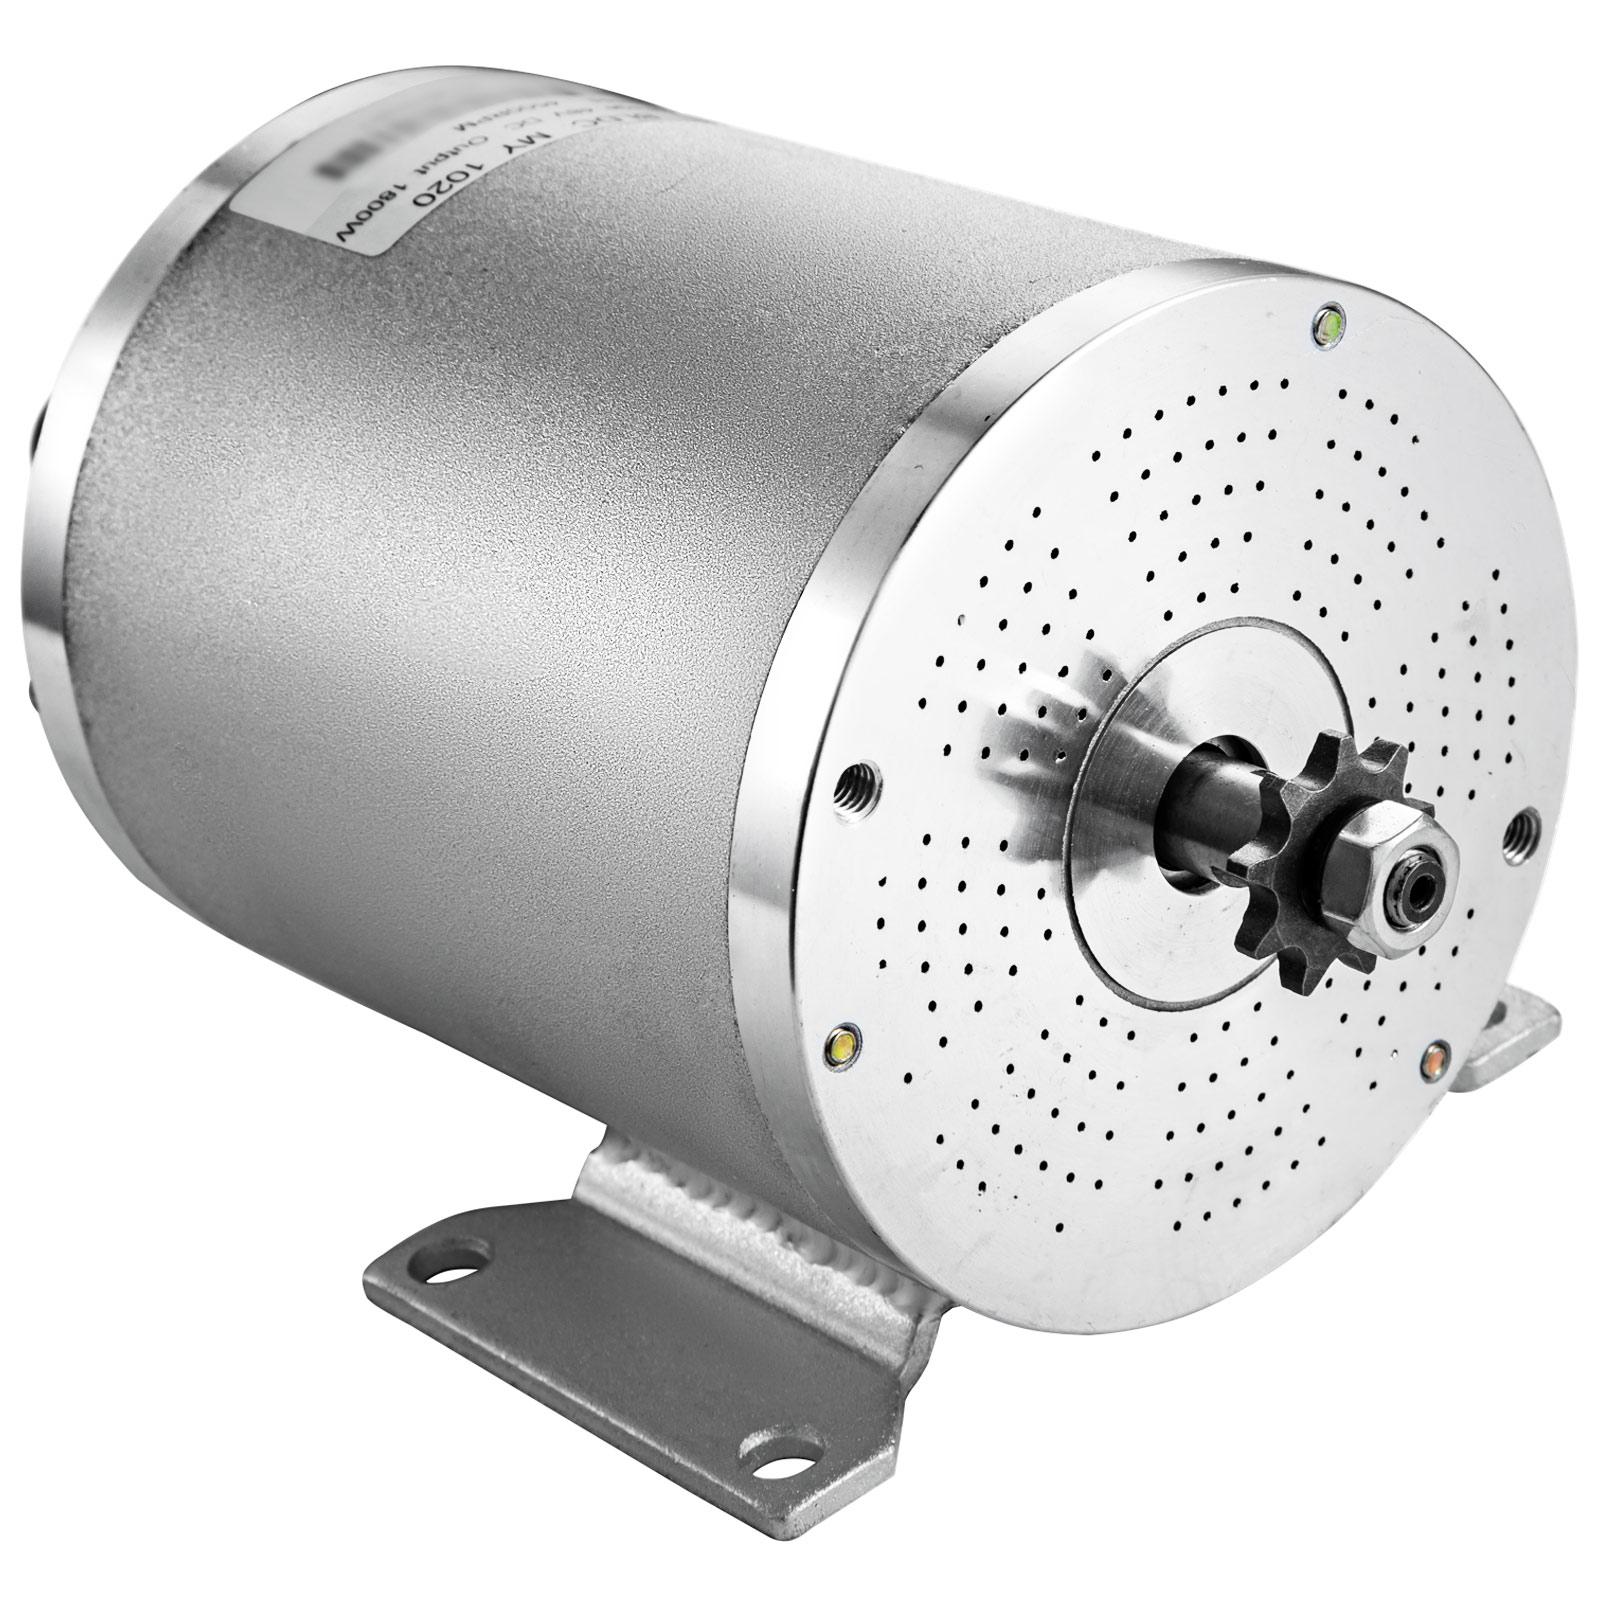 1800W-48V-DC-Brushless-Electric-Motor-Kit-f-Scooter-500-1800W-E-Bike-Go-Kart thumbnail 204